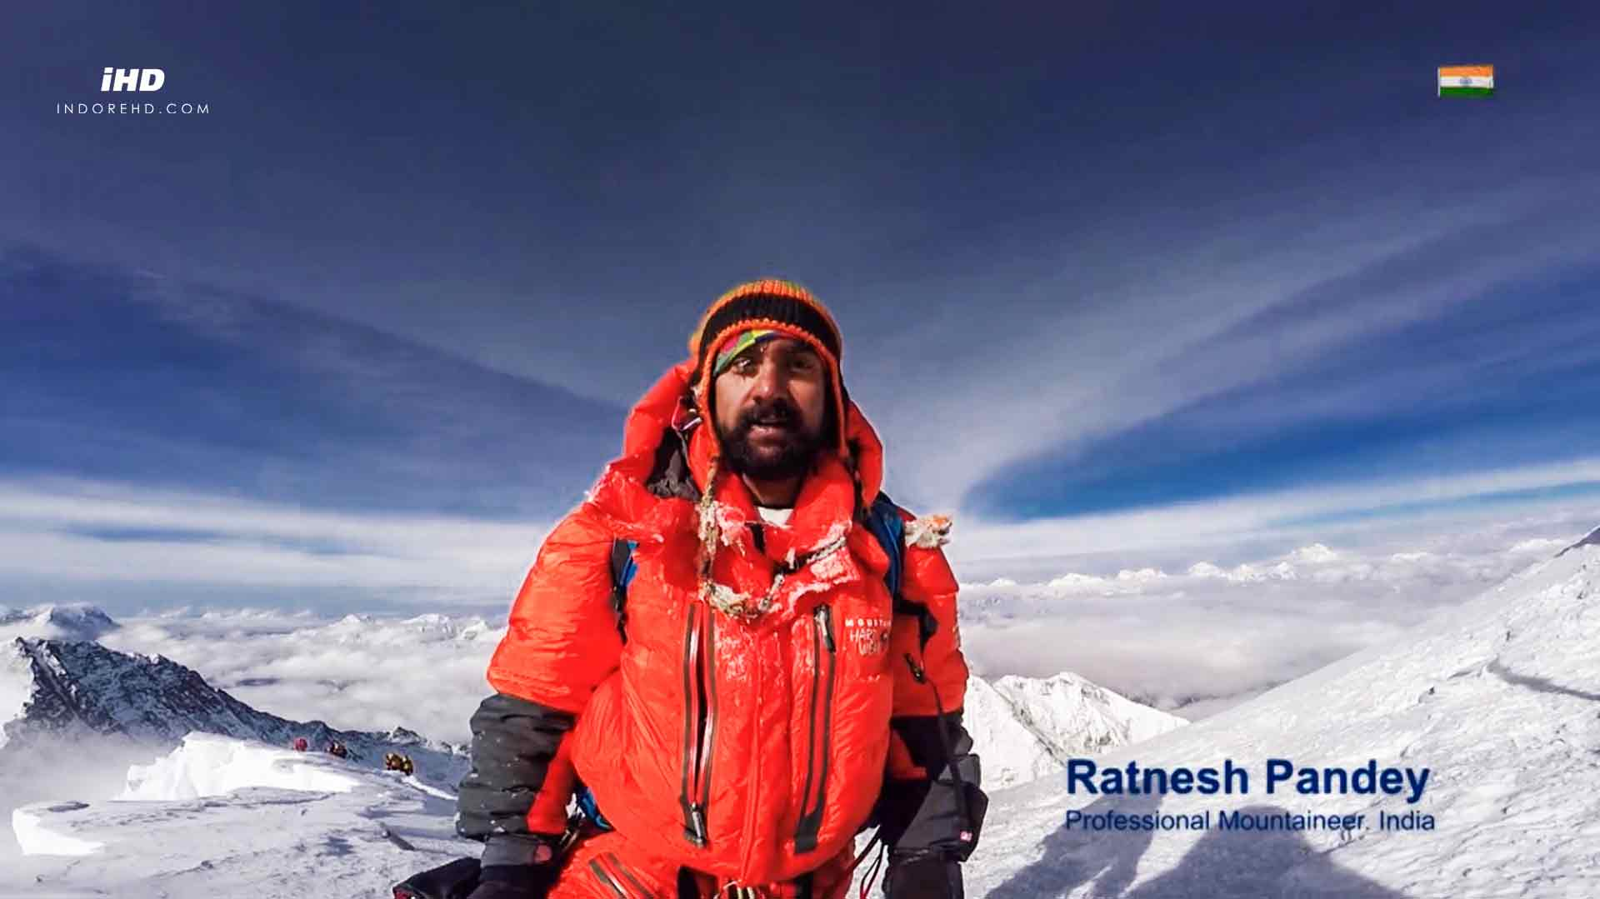 Ratnesh-Pandey-Mount-Everest-National-Anthem-Singing-IndoreHD